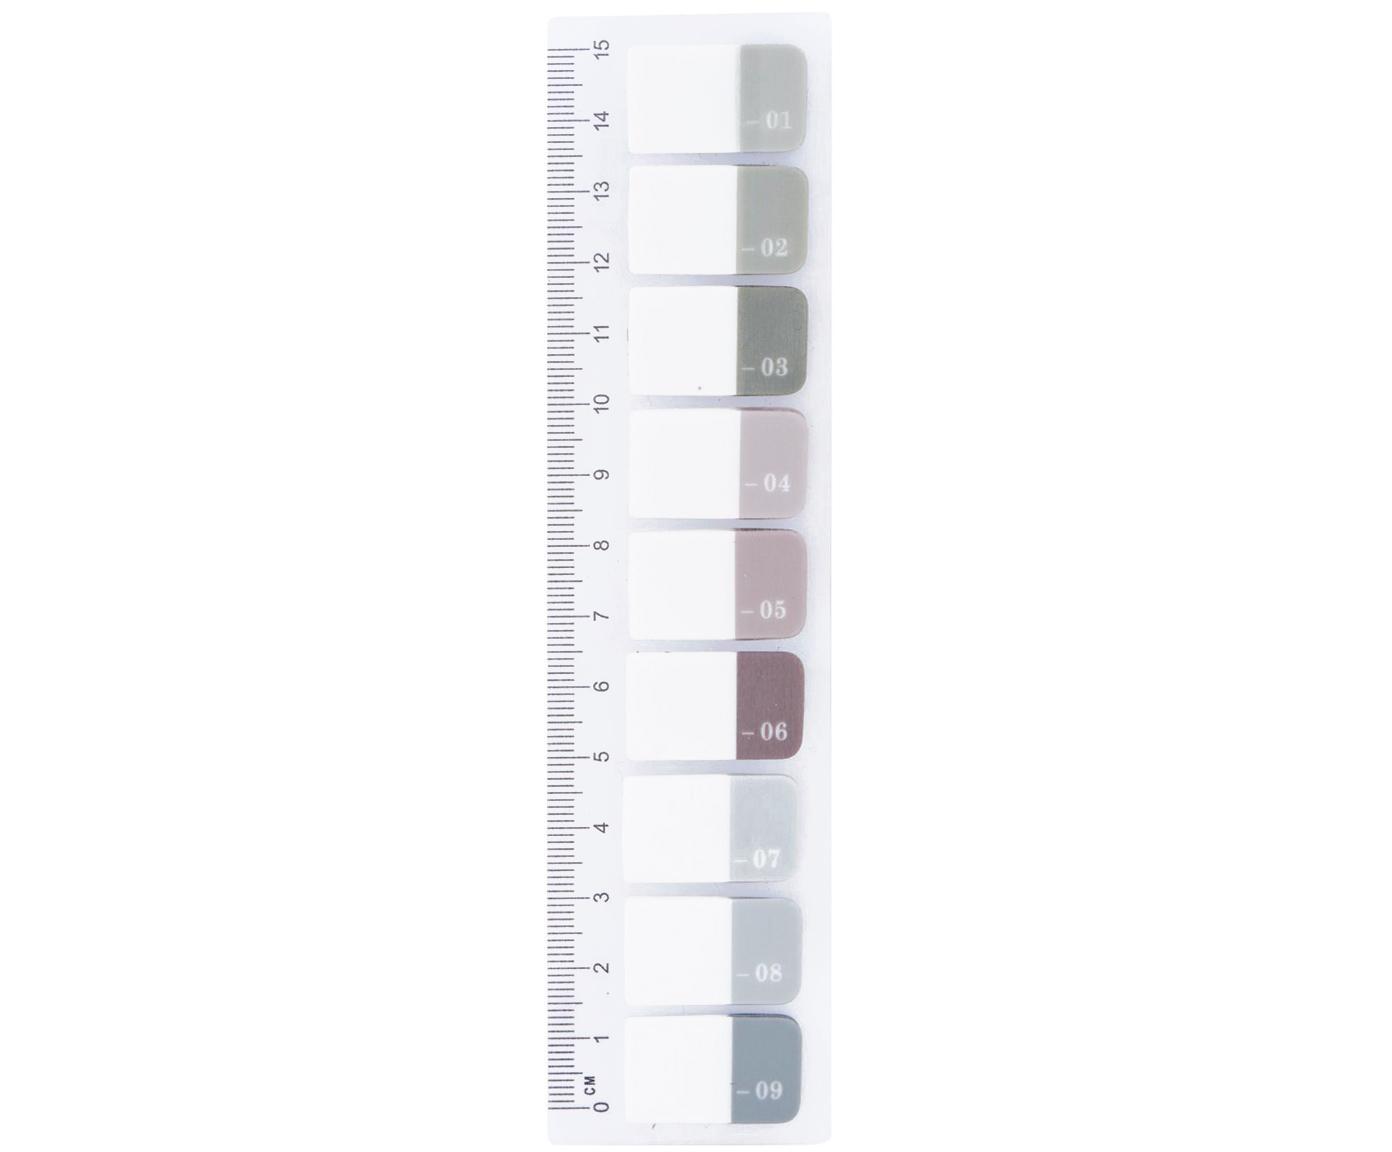 Lineal Index, Kunststoff, Mehrfarbig, 4 x 15 cm